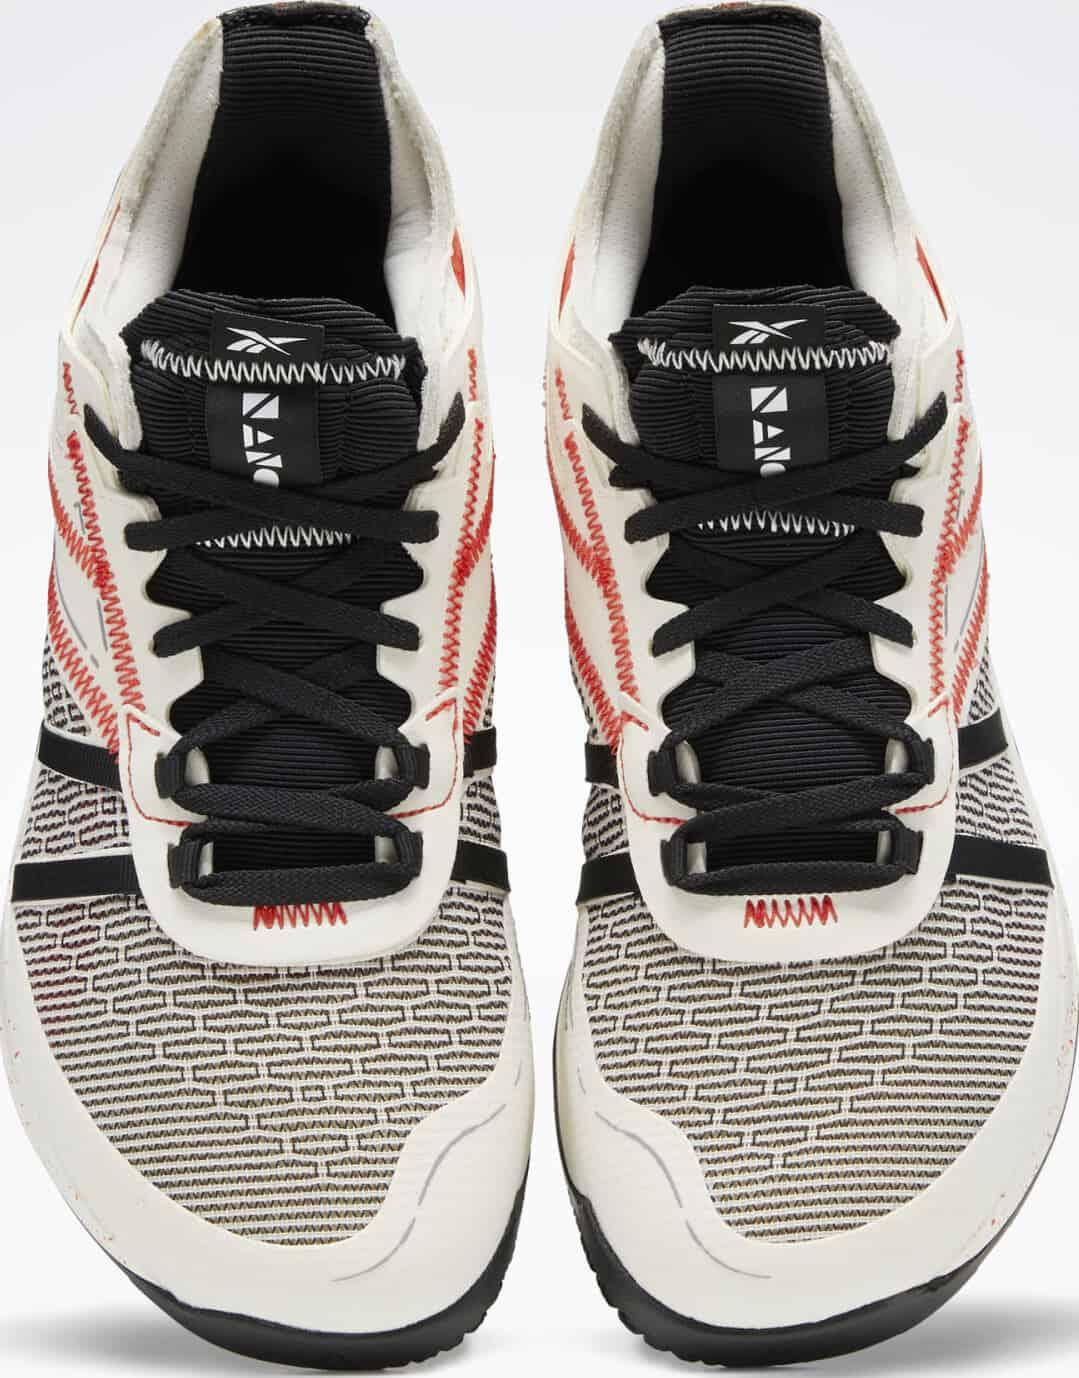 Reebok Nano Inside Out Training Shoes top